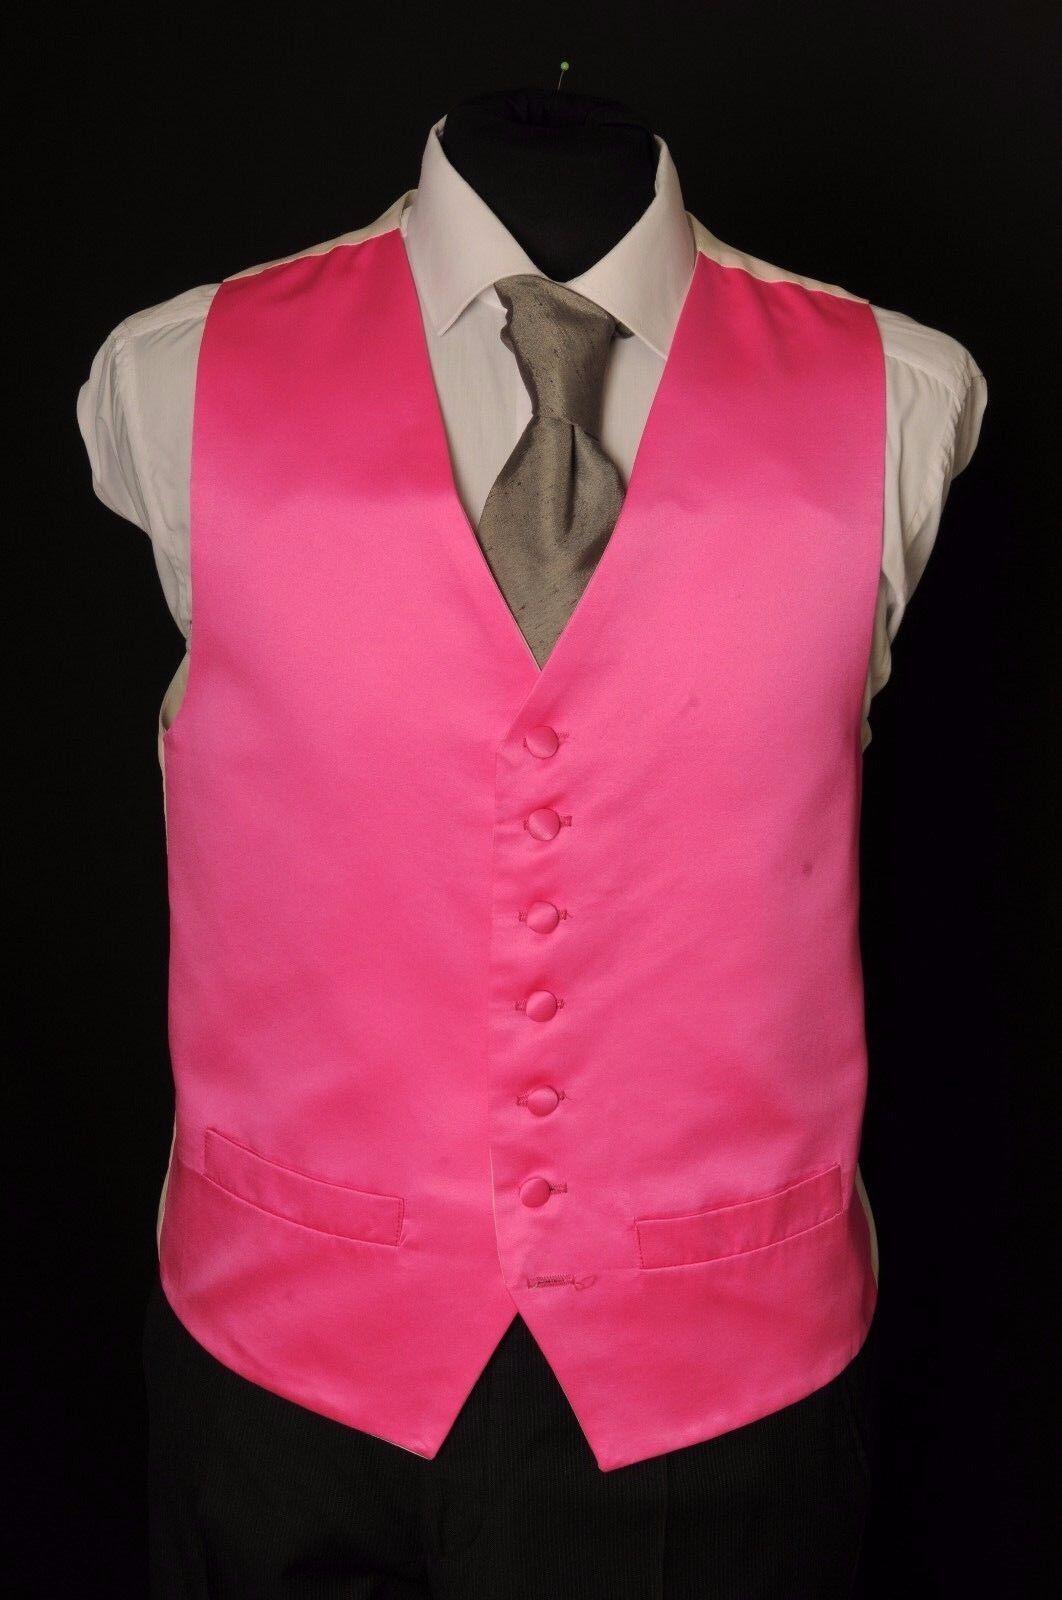 MENS/BOYS BRIGHT CANDY PINK SATIN WEDDING WAISTCOAT/ DRESS / FANCY / W - 1095.